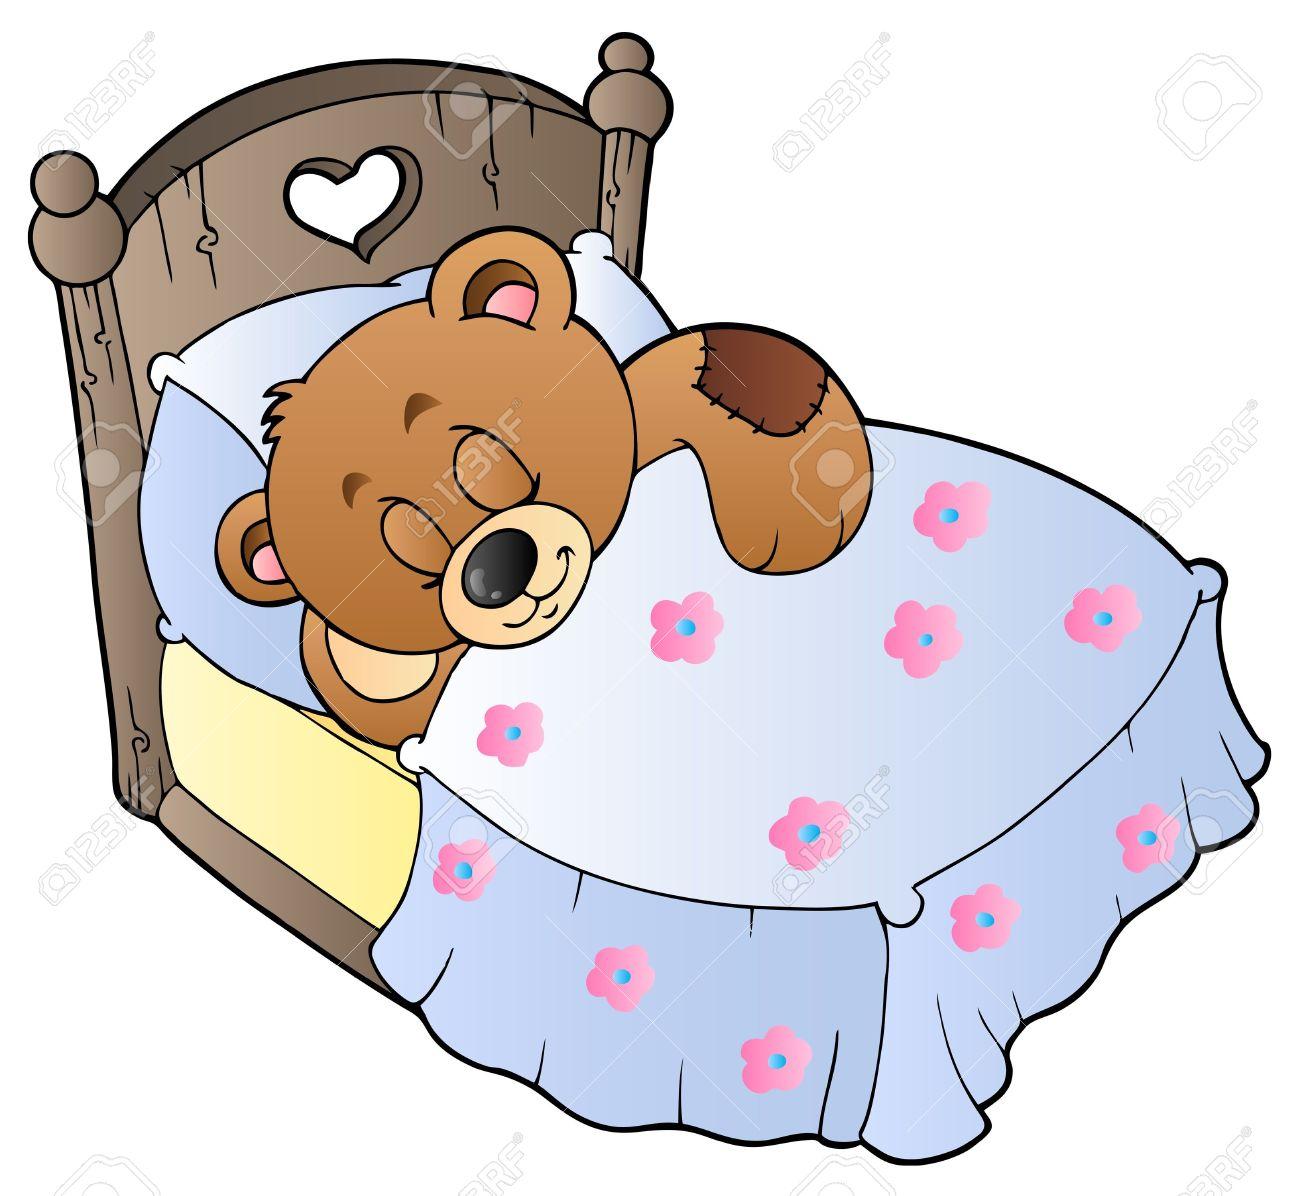 1300x1196 8799946 Cute Sleeping Teddy Bear Stock Vector Cartoon.jpg (1300